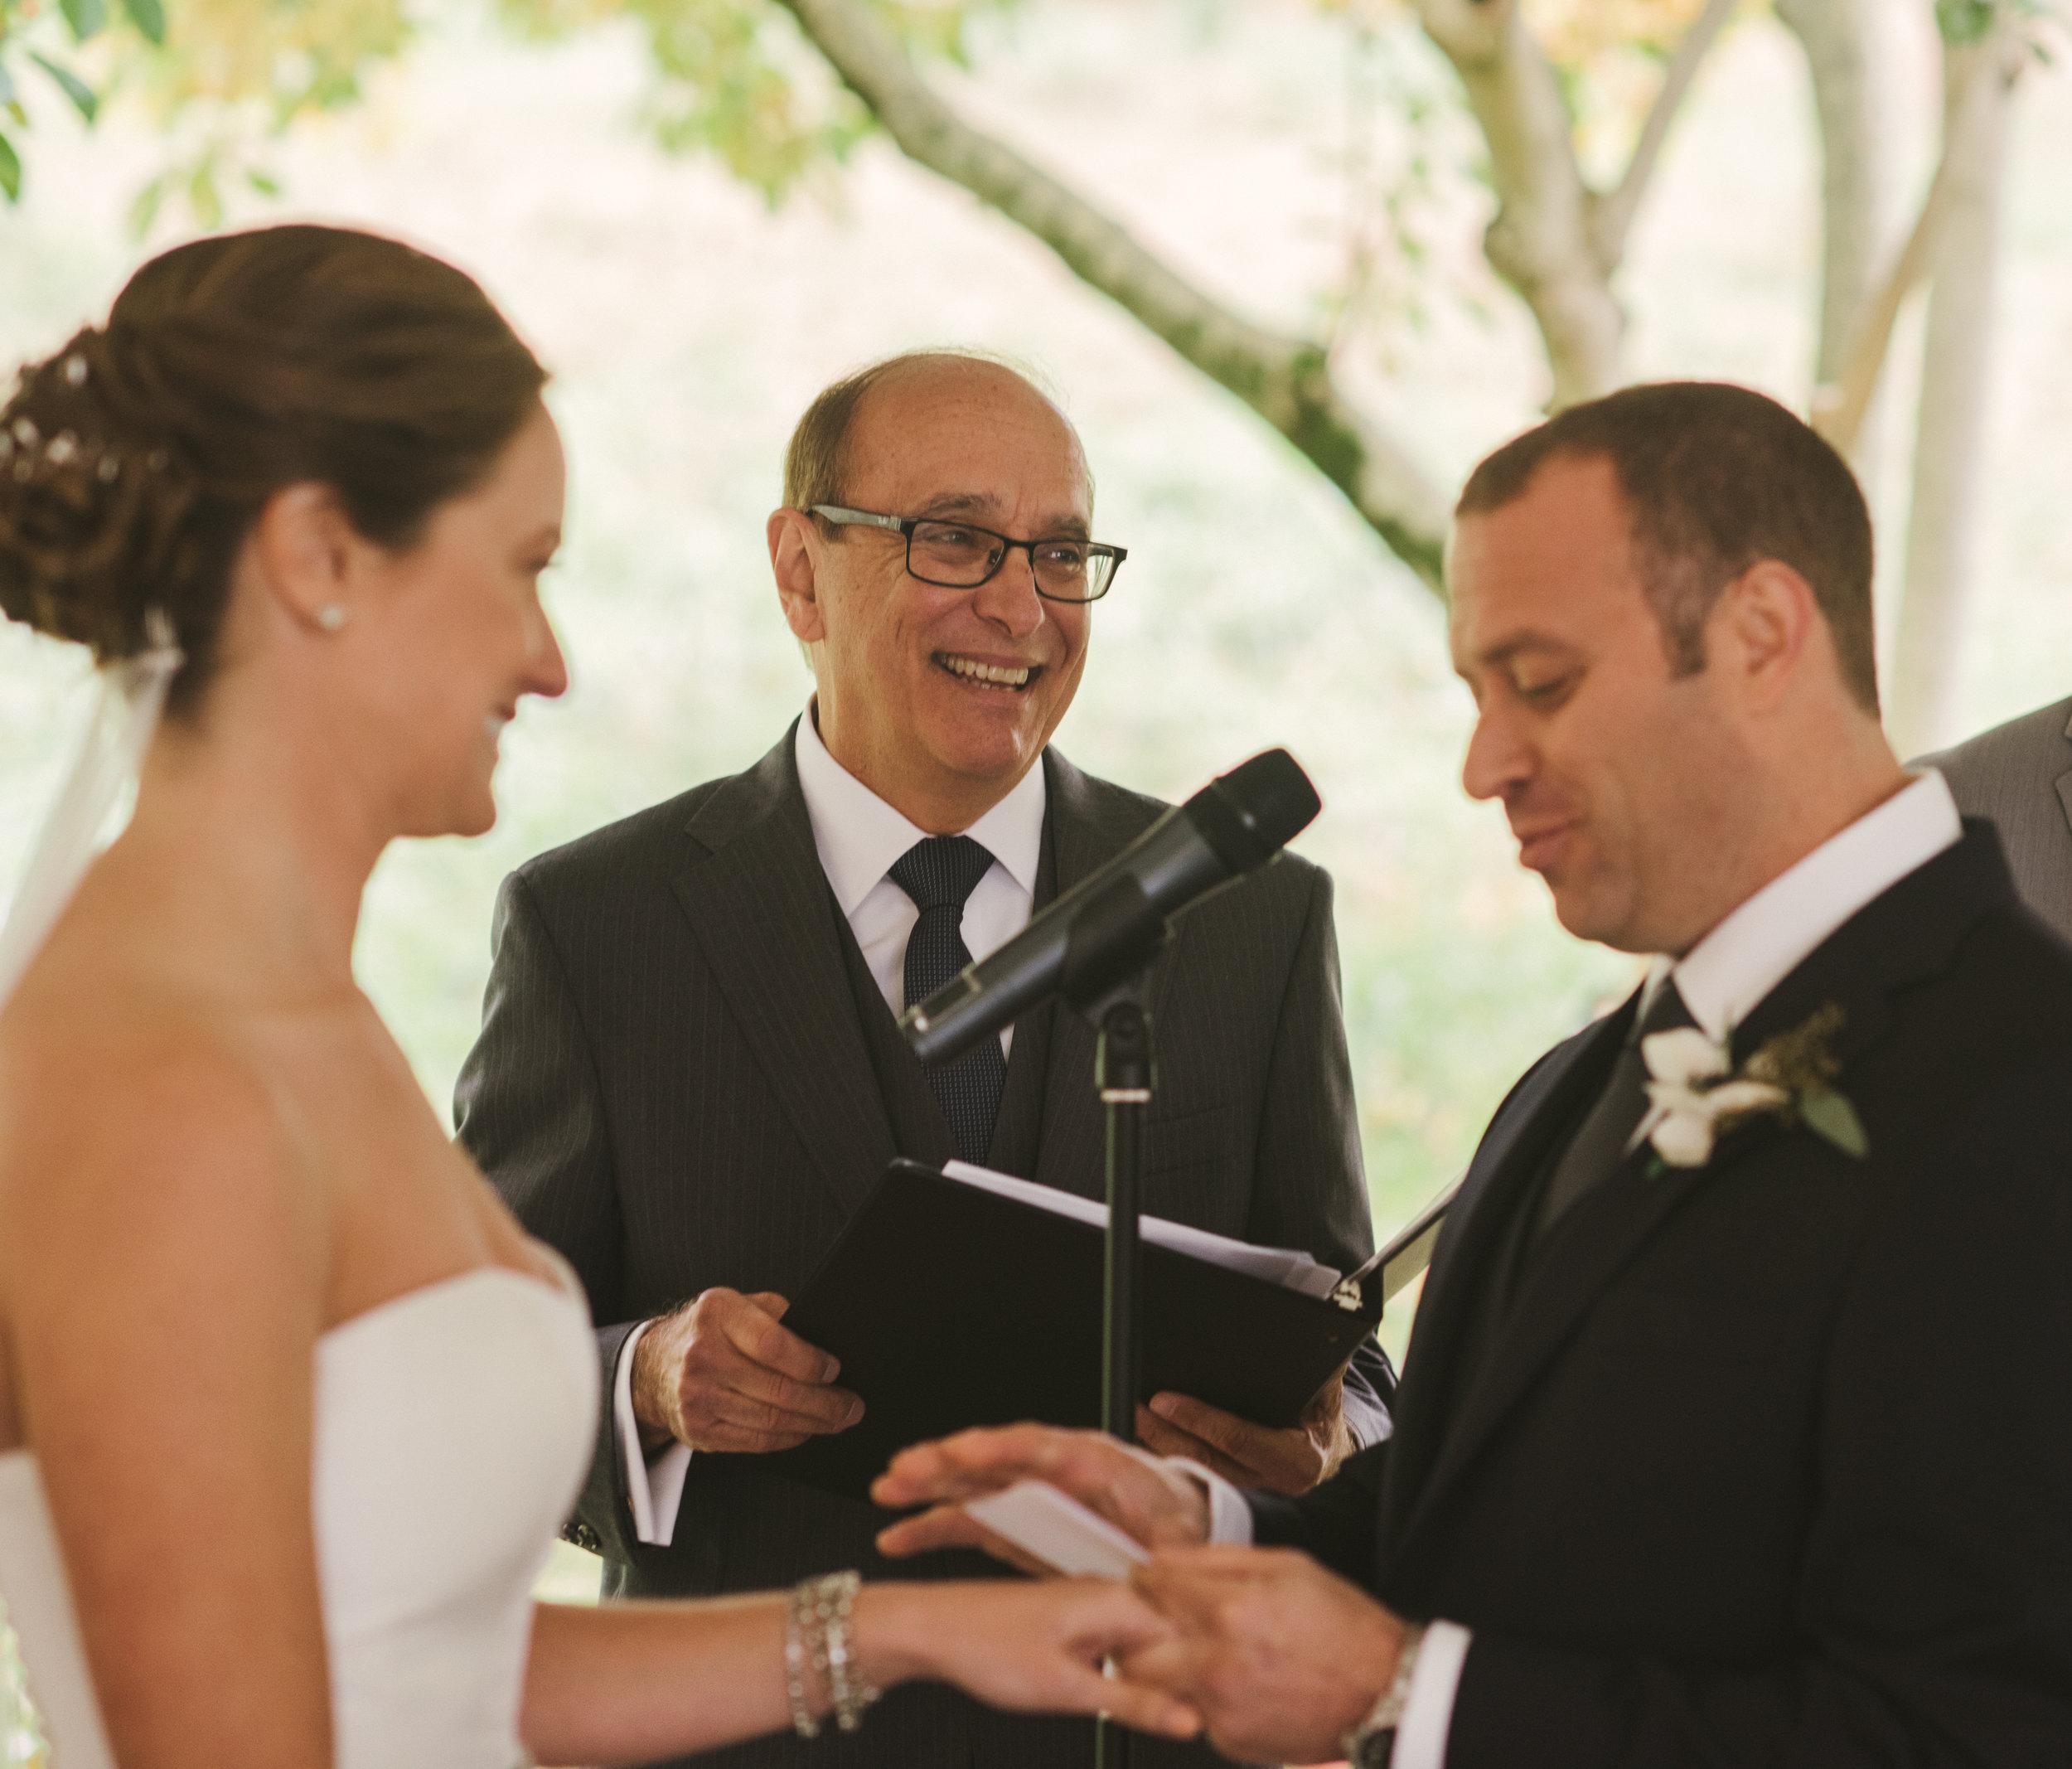 JACQUELINE & ANDREW WARSHAWER -BROOKMILL FARM FALL WEDDING - INTIMATE WEDDING PHOTOGRAPHER - TWOTWENTY by CHI-CHI AGBIM-268.jpg